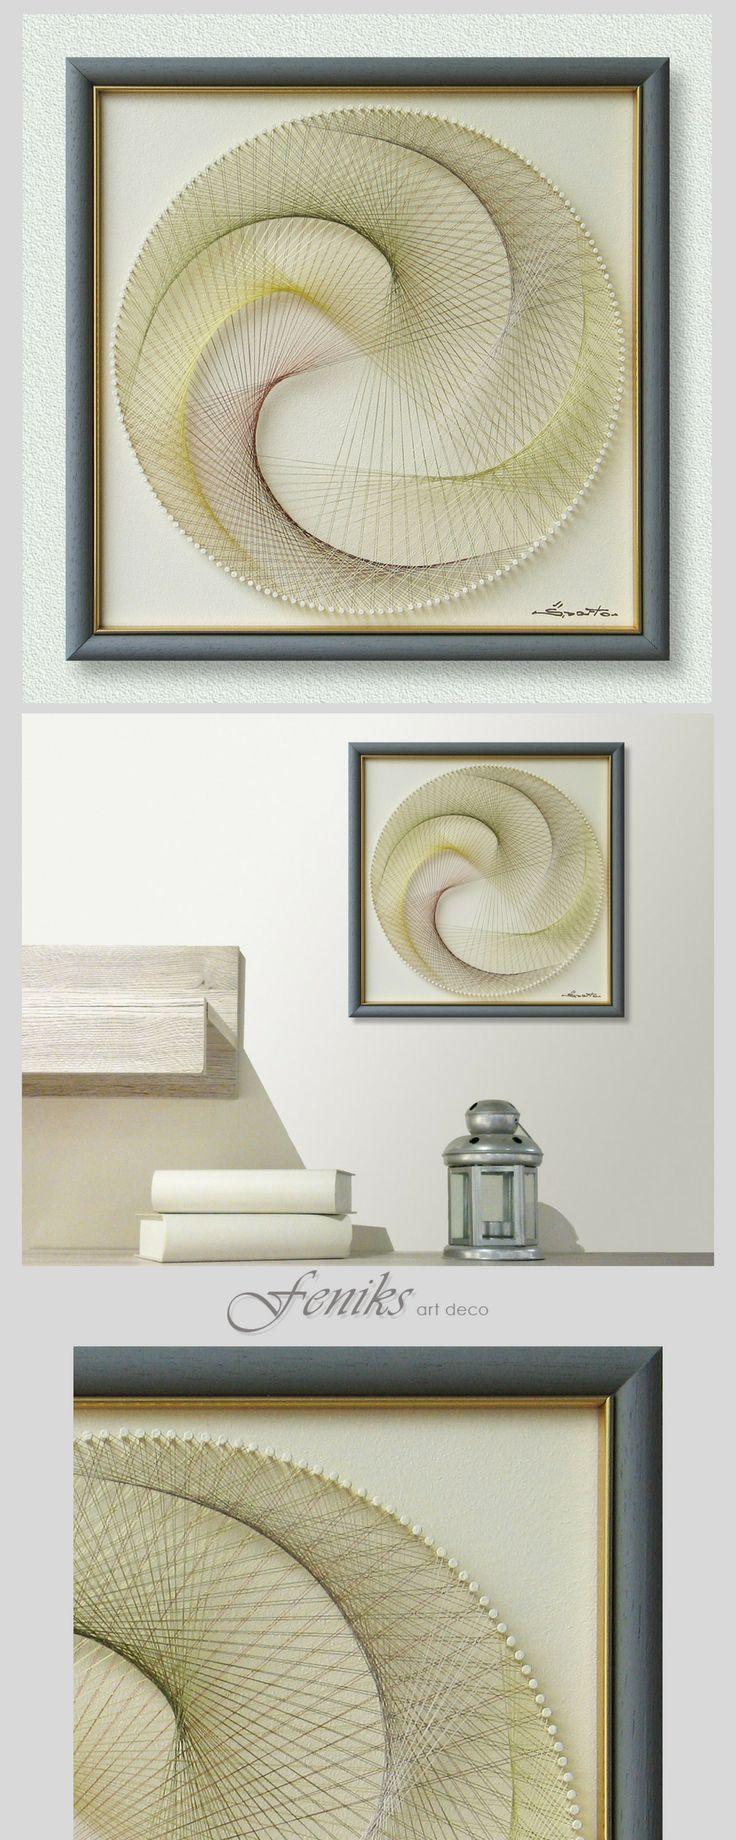 Home interiors and gifts framed art - Sunshine Yellow Wall Art Zen Modern Abstract String Art Spititual Sacred Geometry Golden Ratio Mandala Special Gift Framed Art